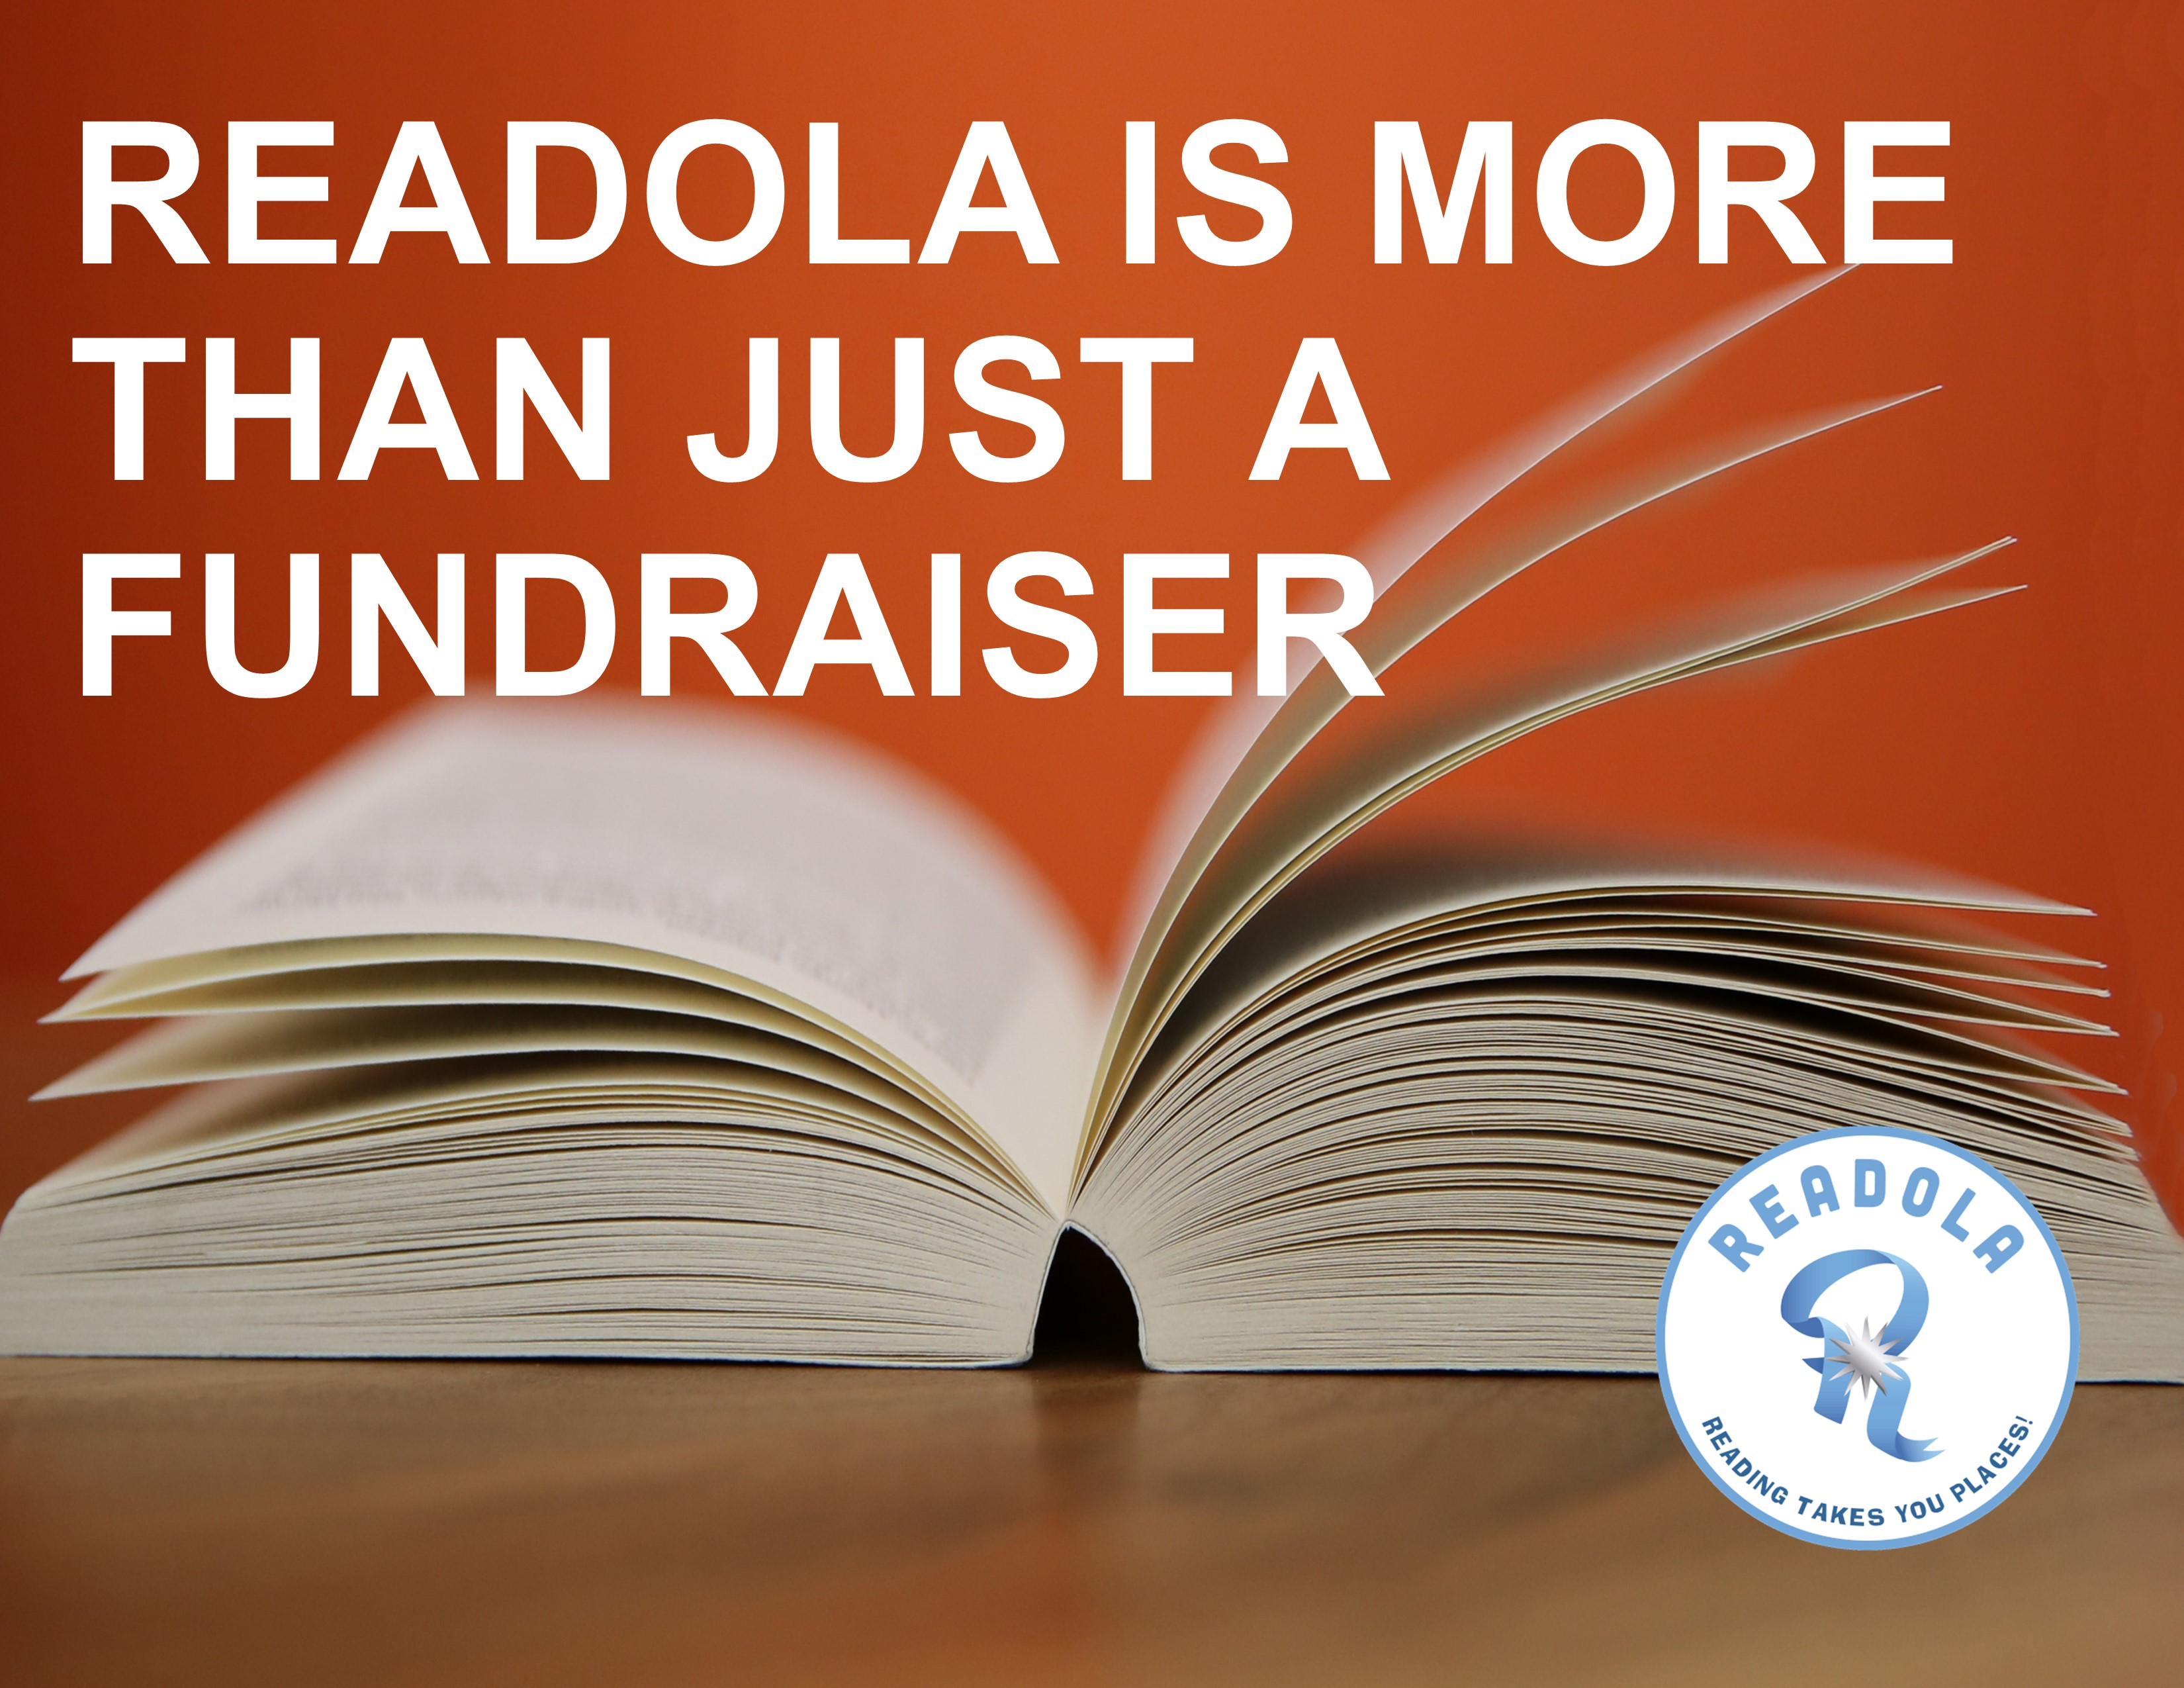 more-than-just-a-fundraiser.jpg